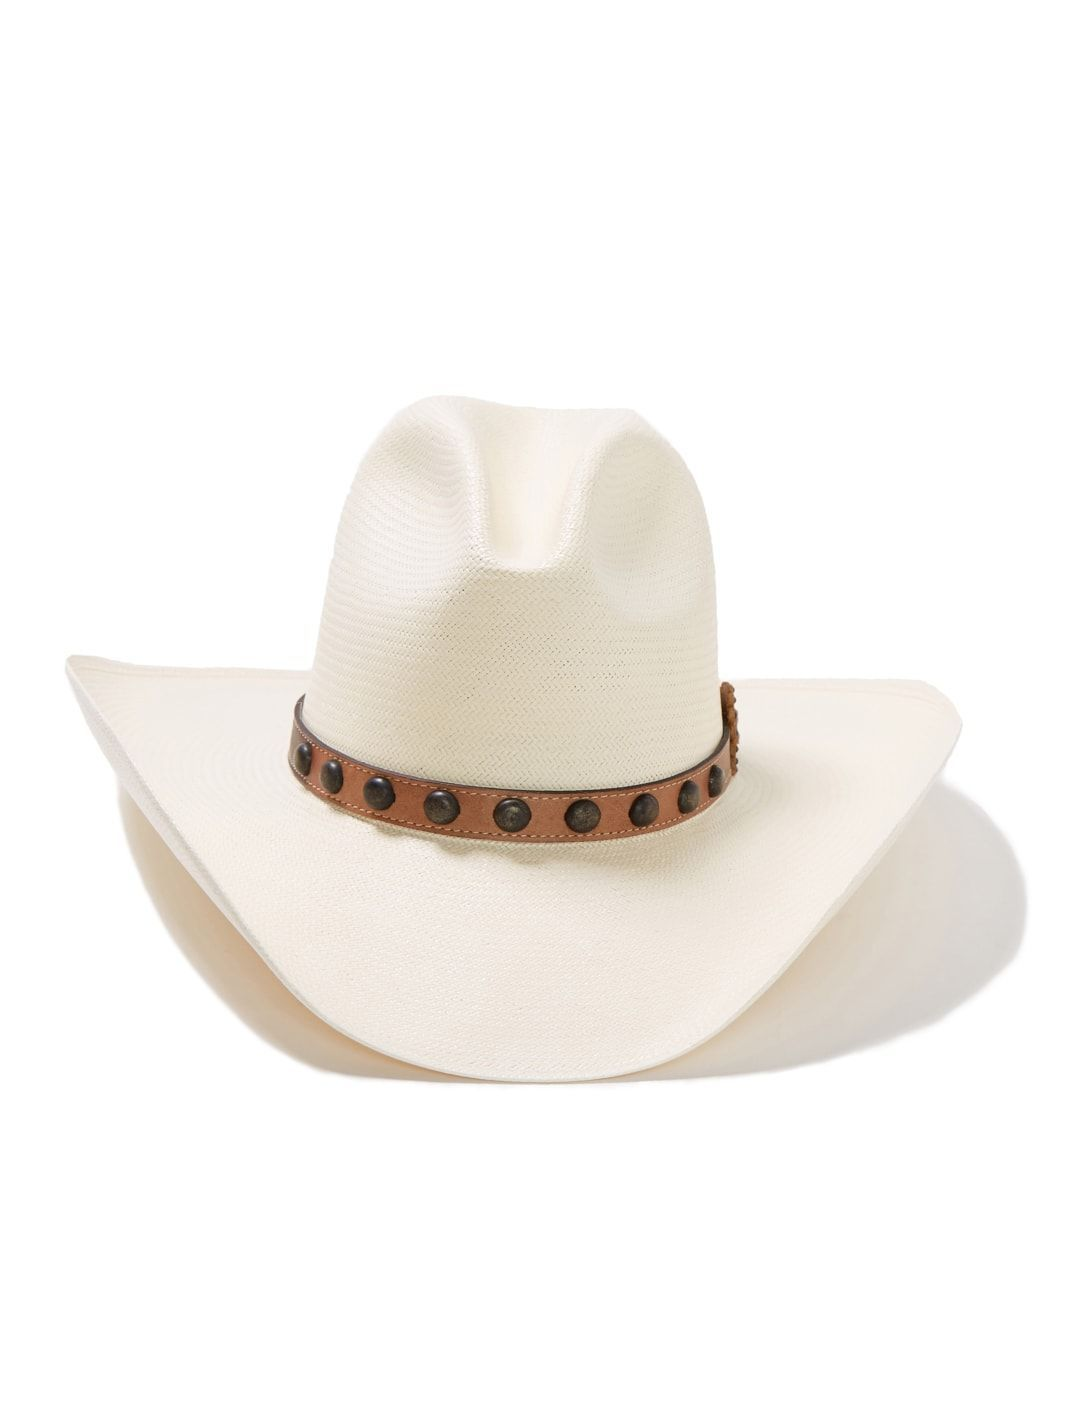 aafc39301dcfc Stetson Men s BROKEN BOW 10X STRAW COWBOY HAT SSBBOW9544. Details